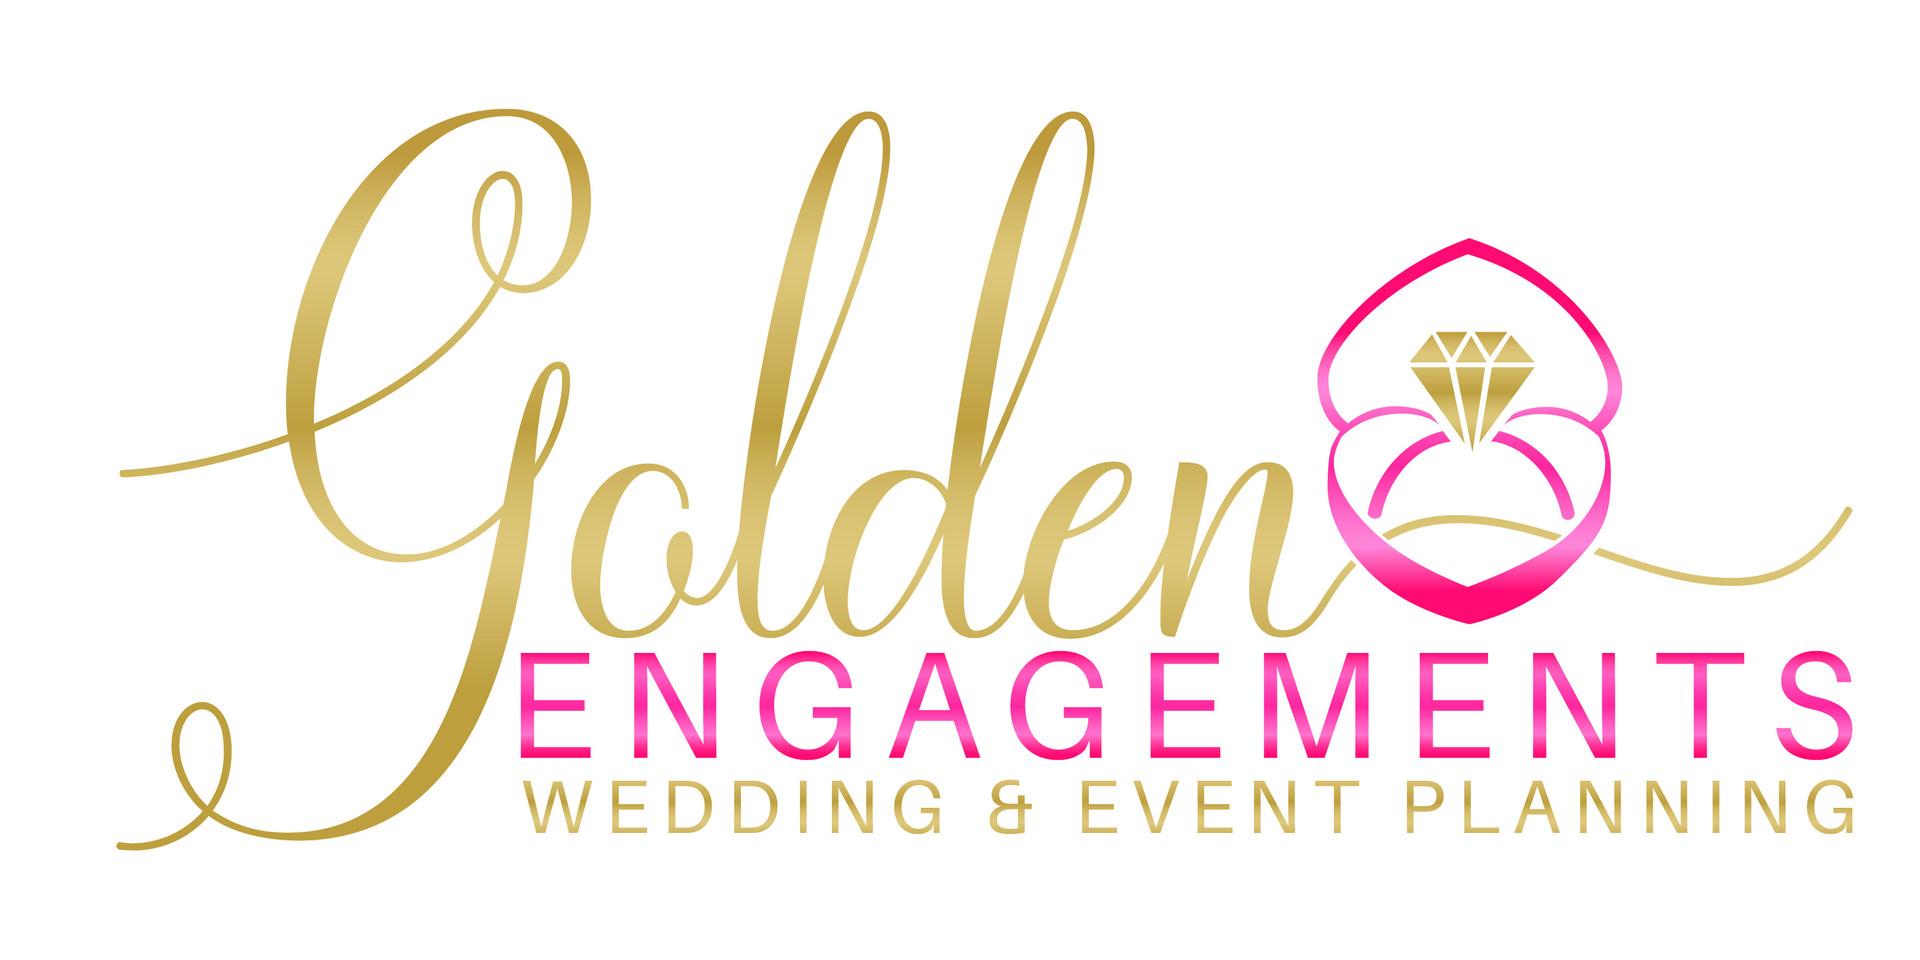 Goldn Engagements Logo.1.jpg